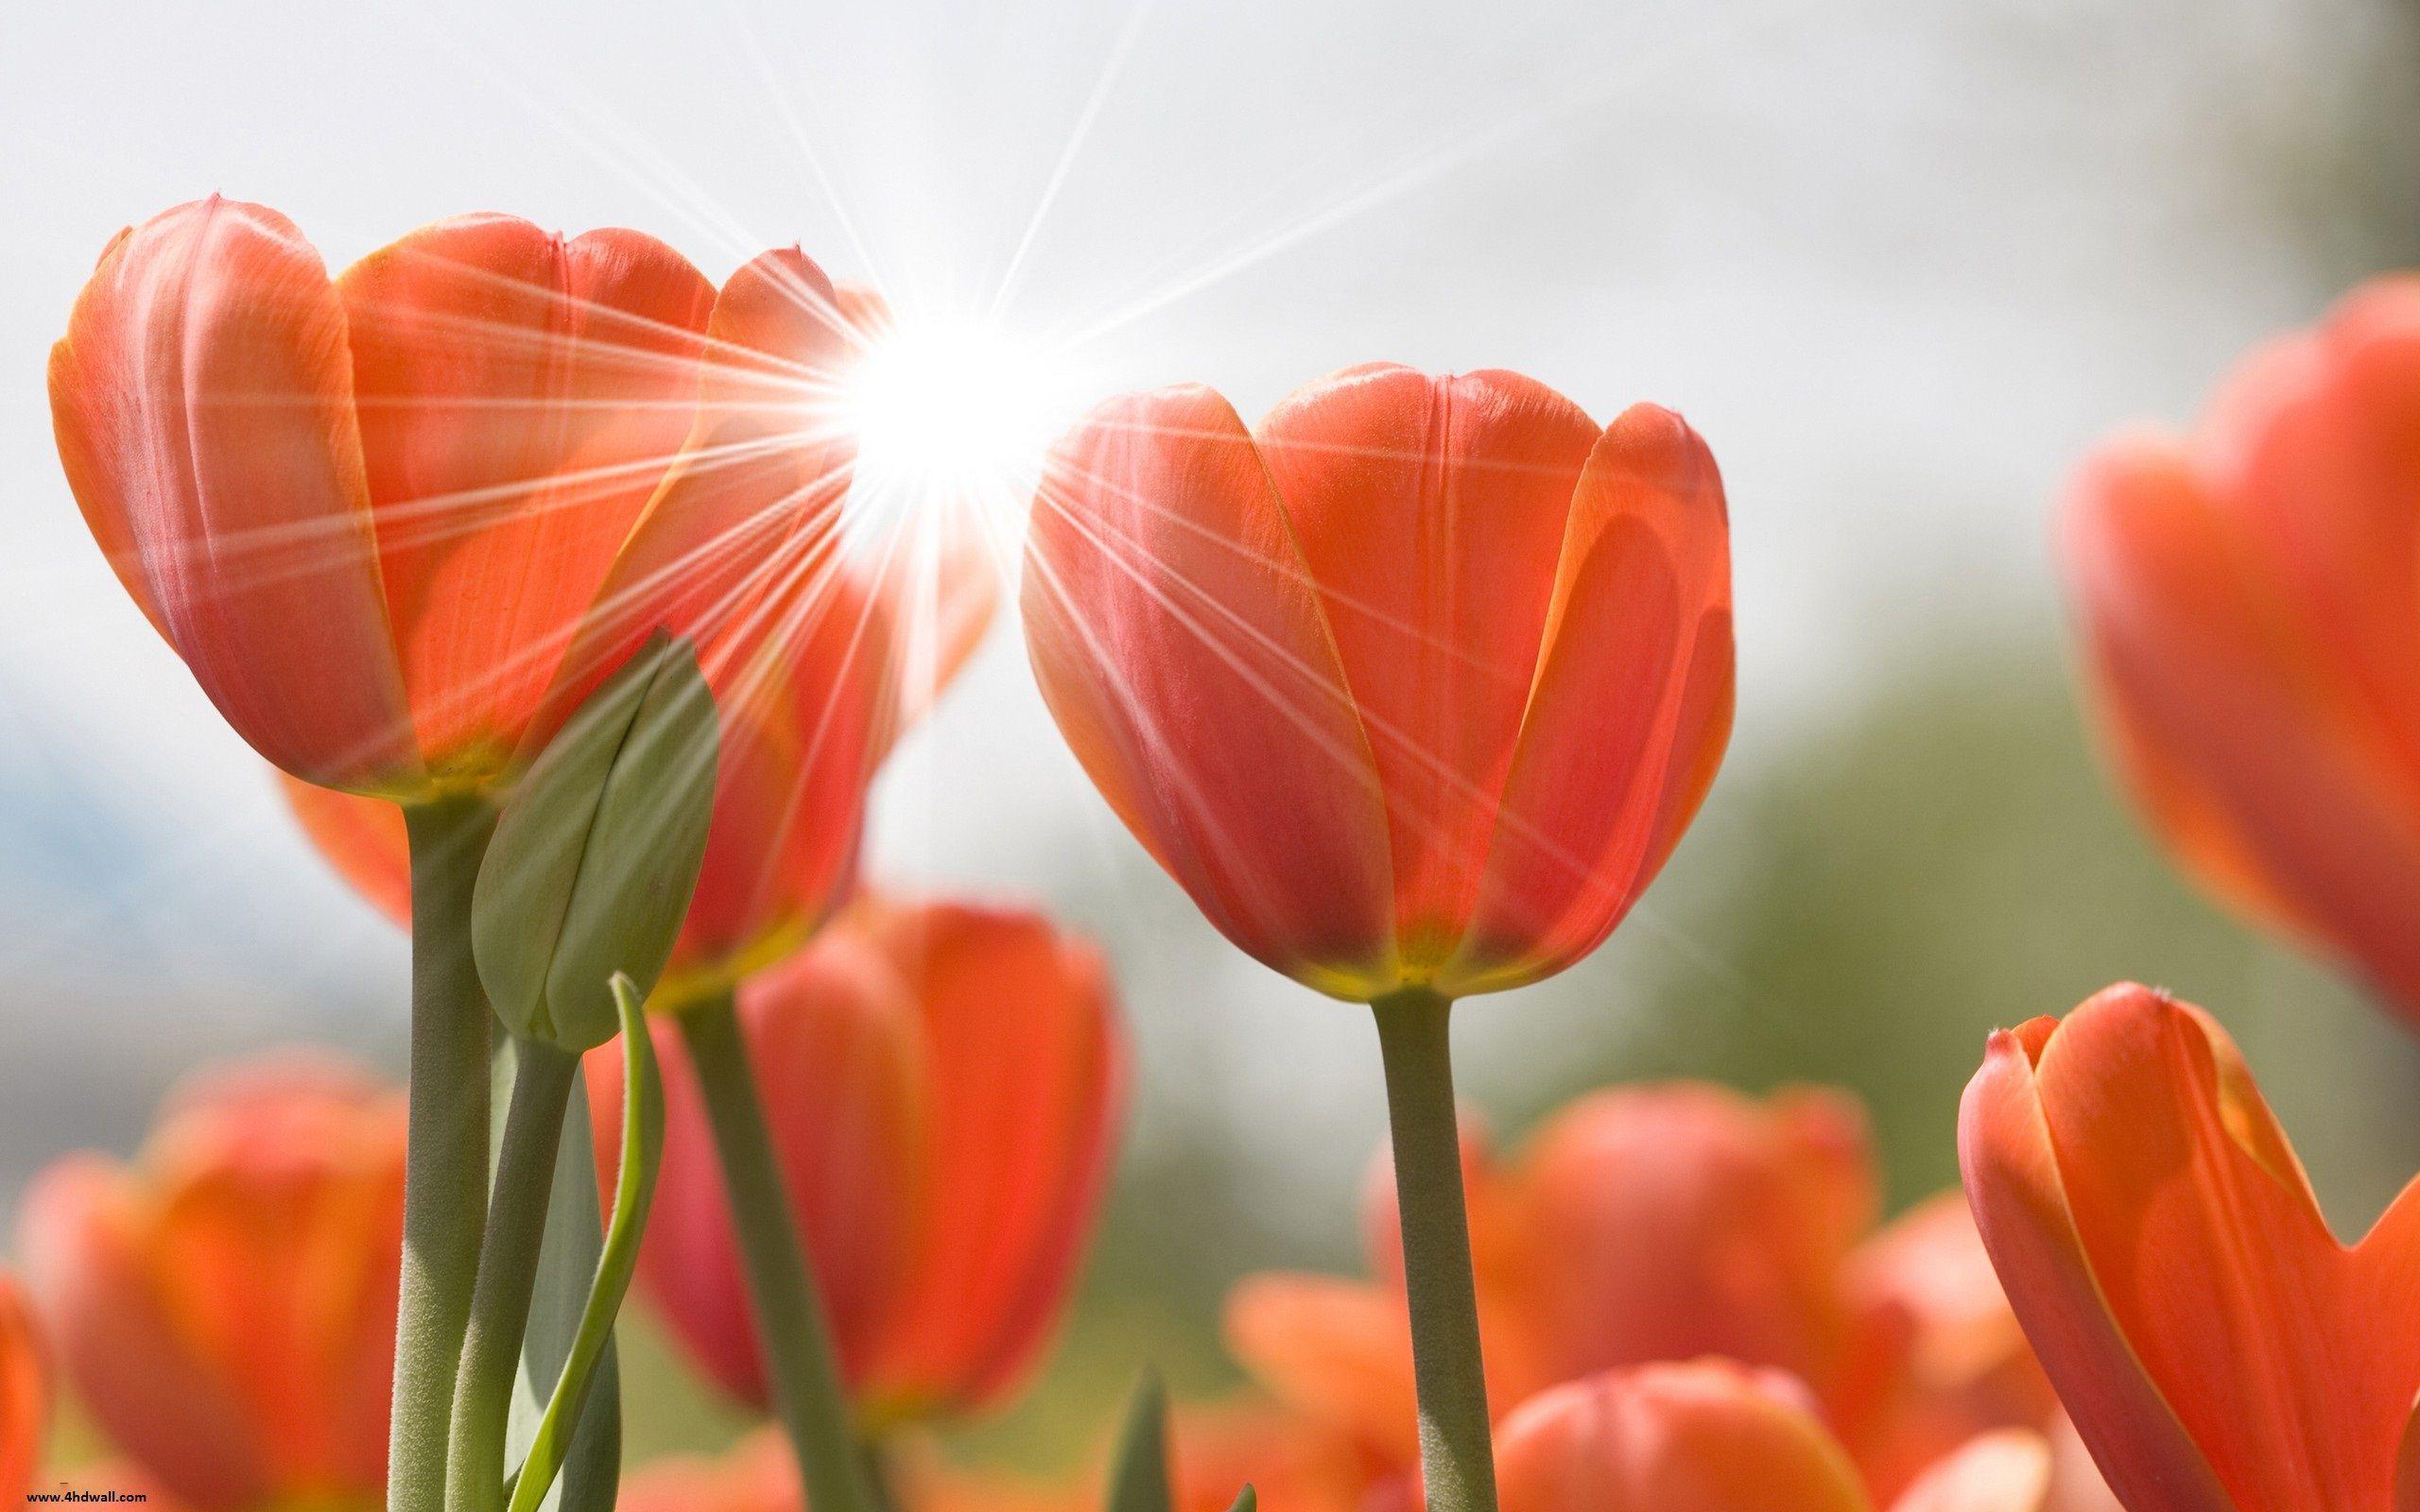 Tulips Wallpaper - Spring Tulips Wallpaper Hd , HD Wallpaper & Backgrounds